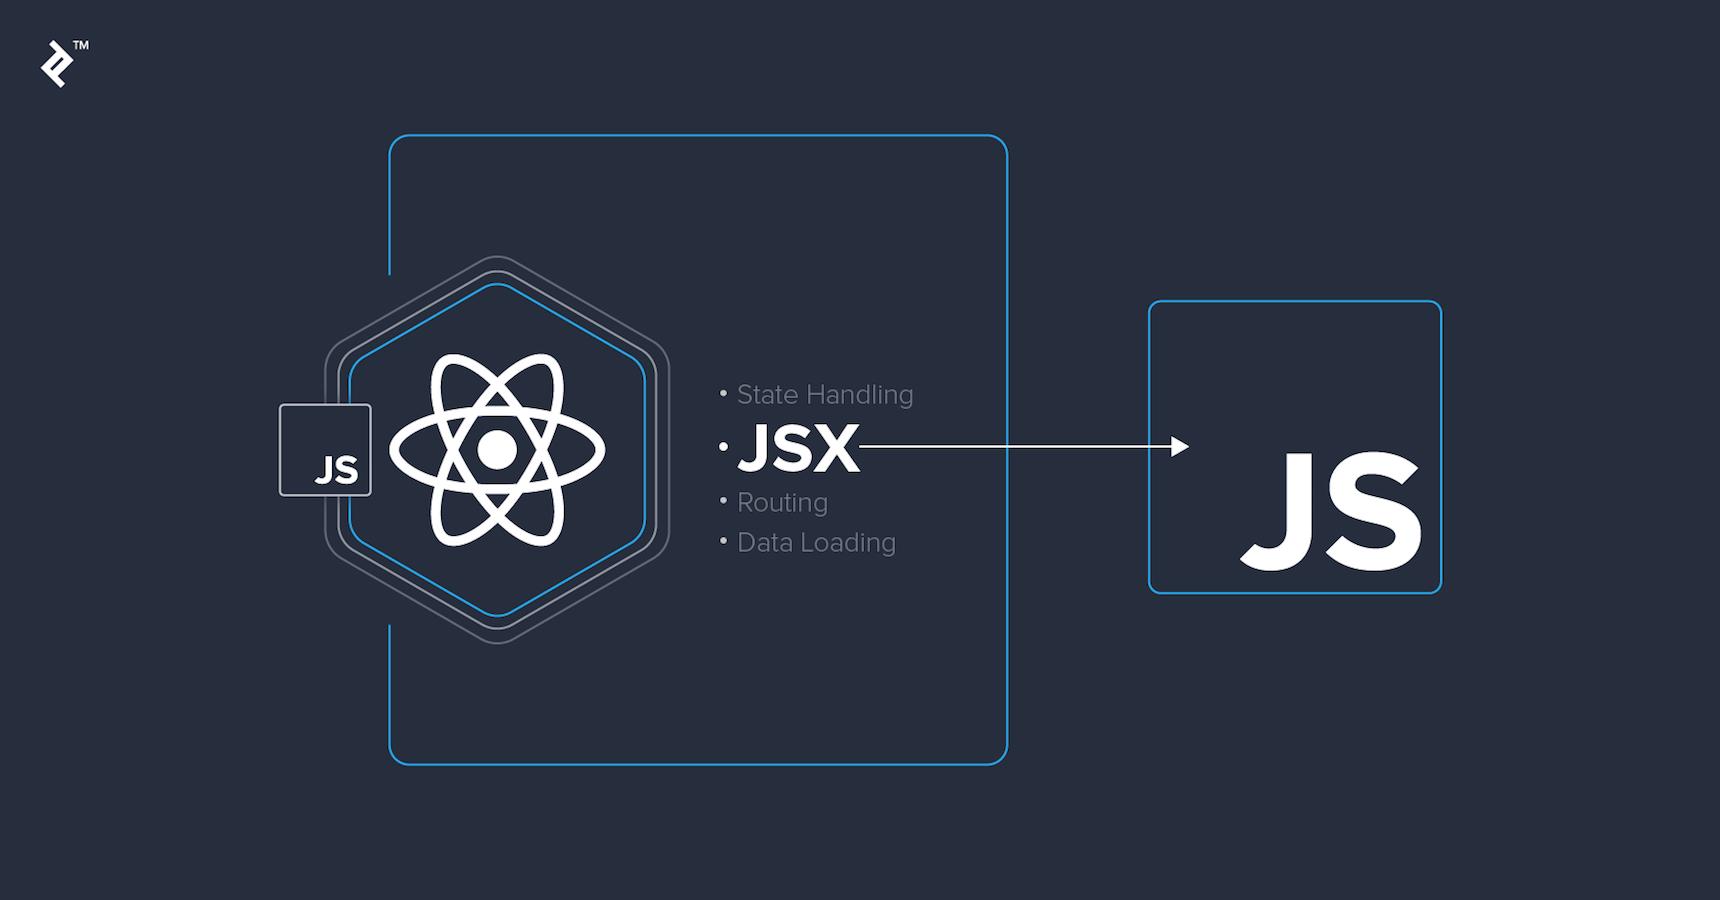 jsx چیست؟